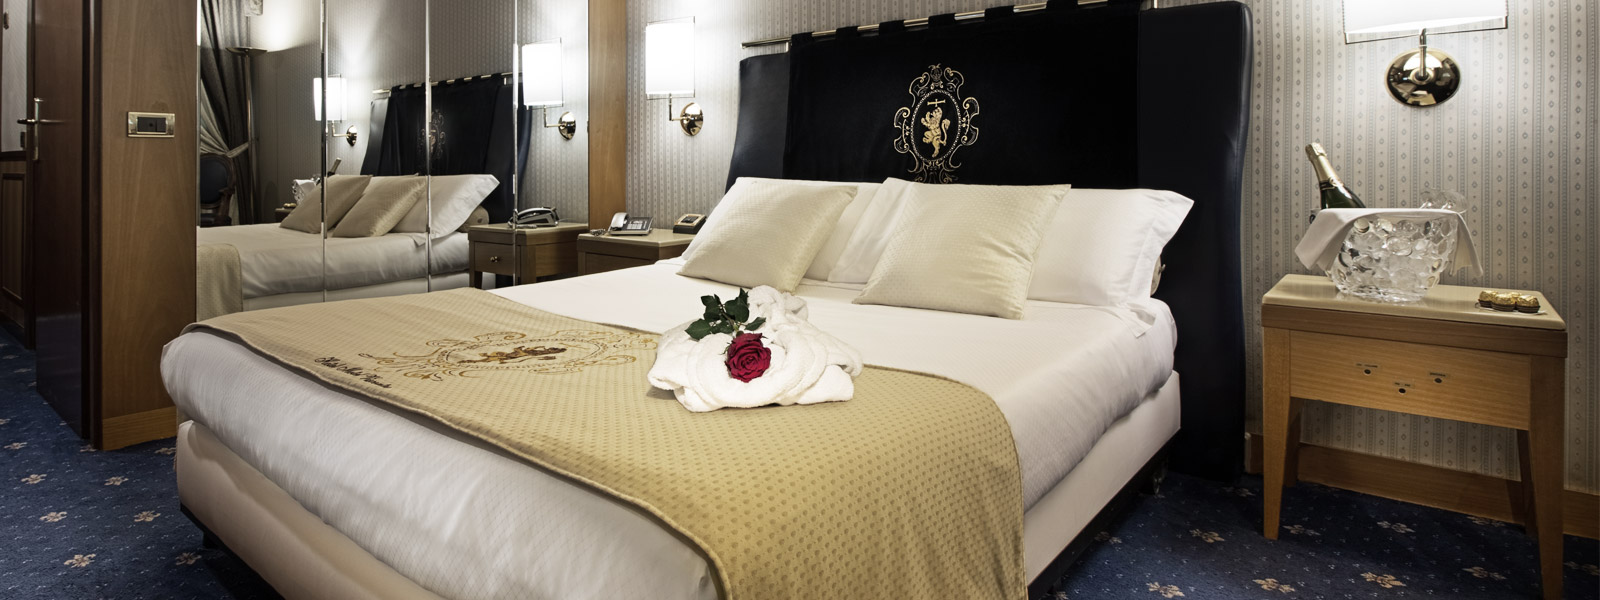 hotel milano sud 4 stelle hotel visconteo offerta 10 sconto